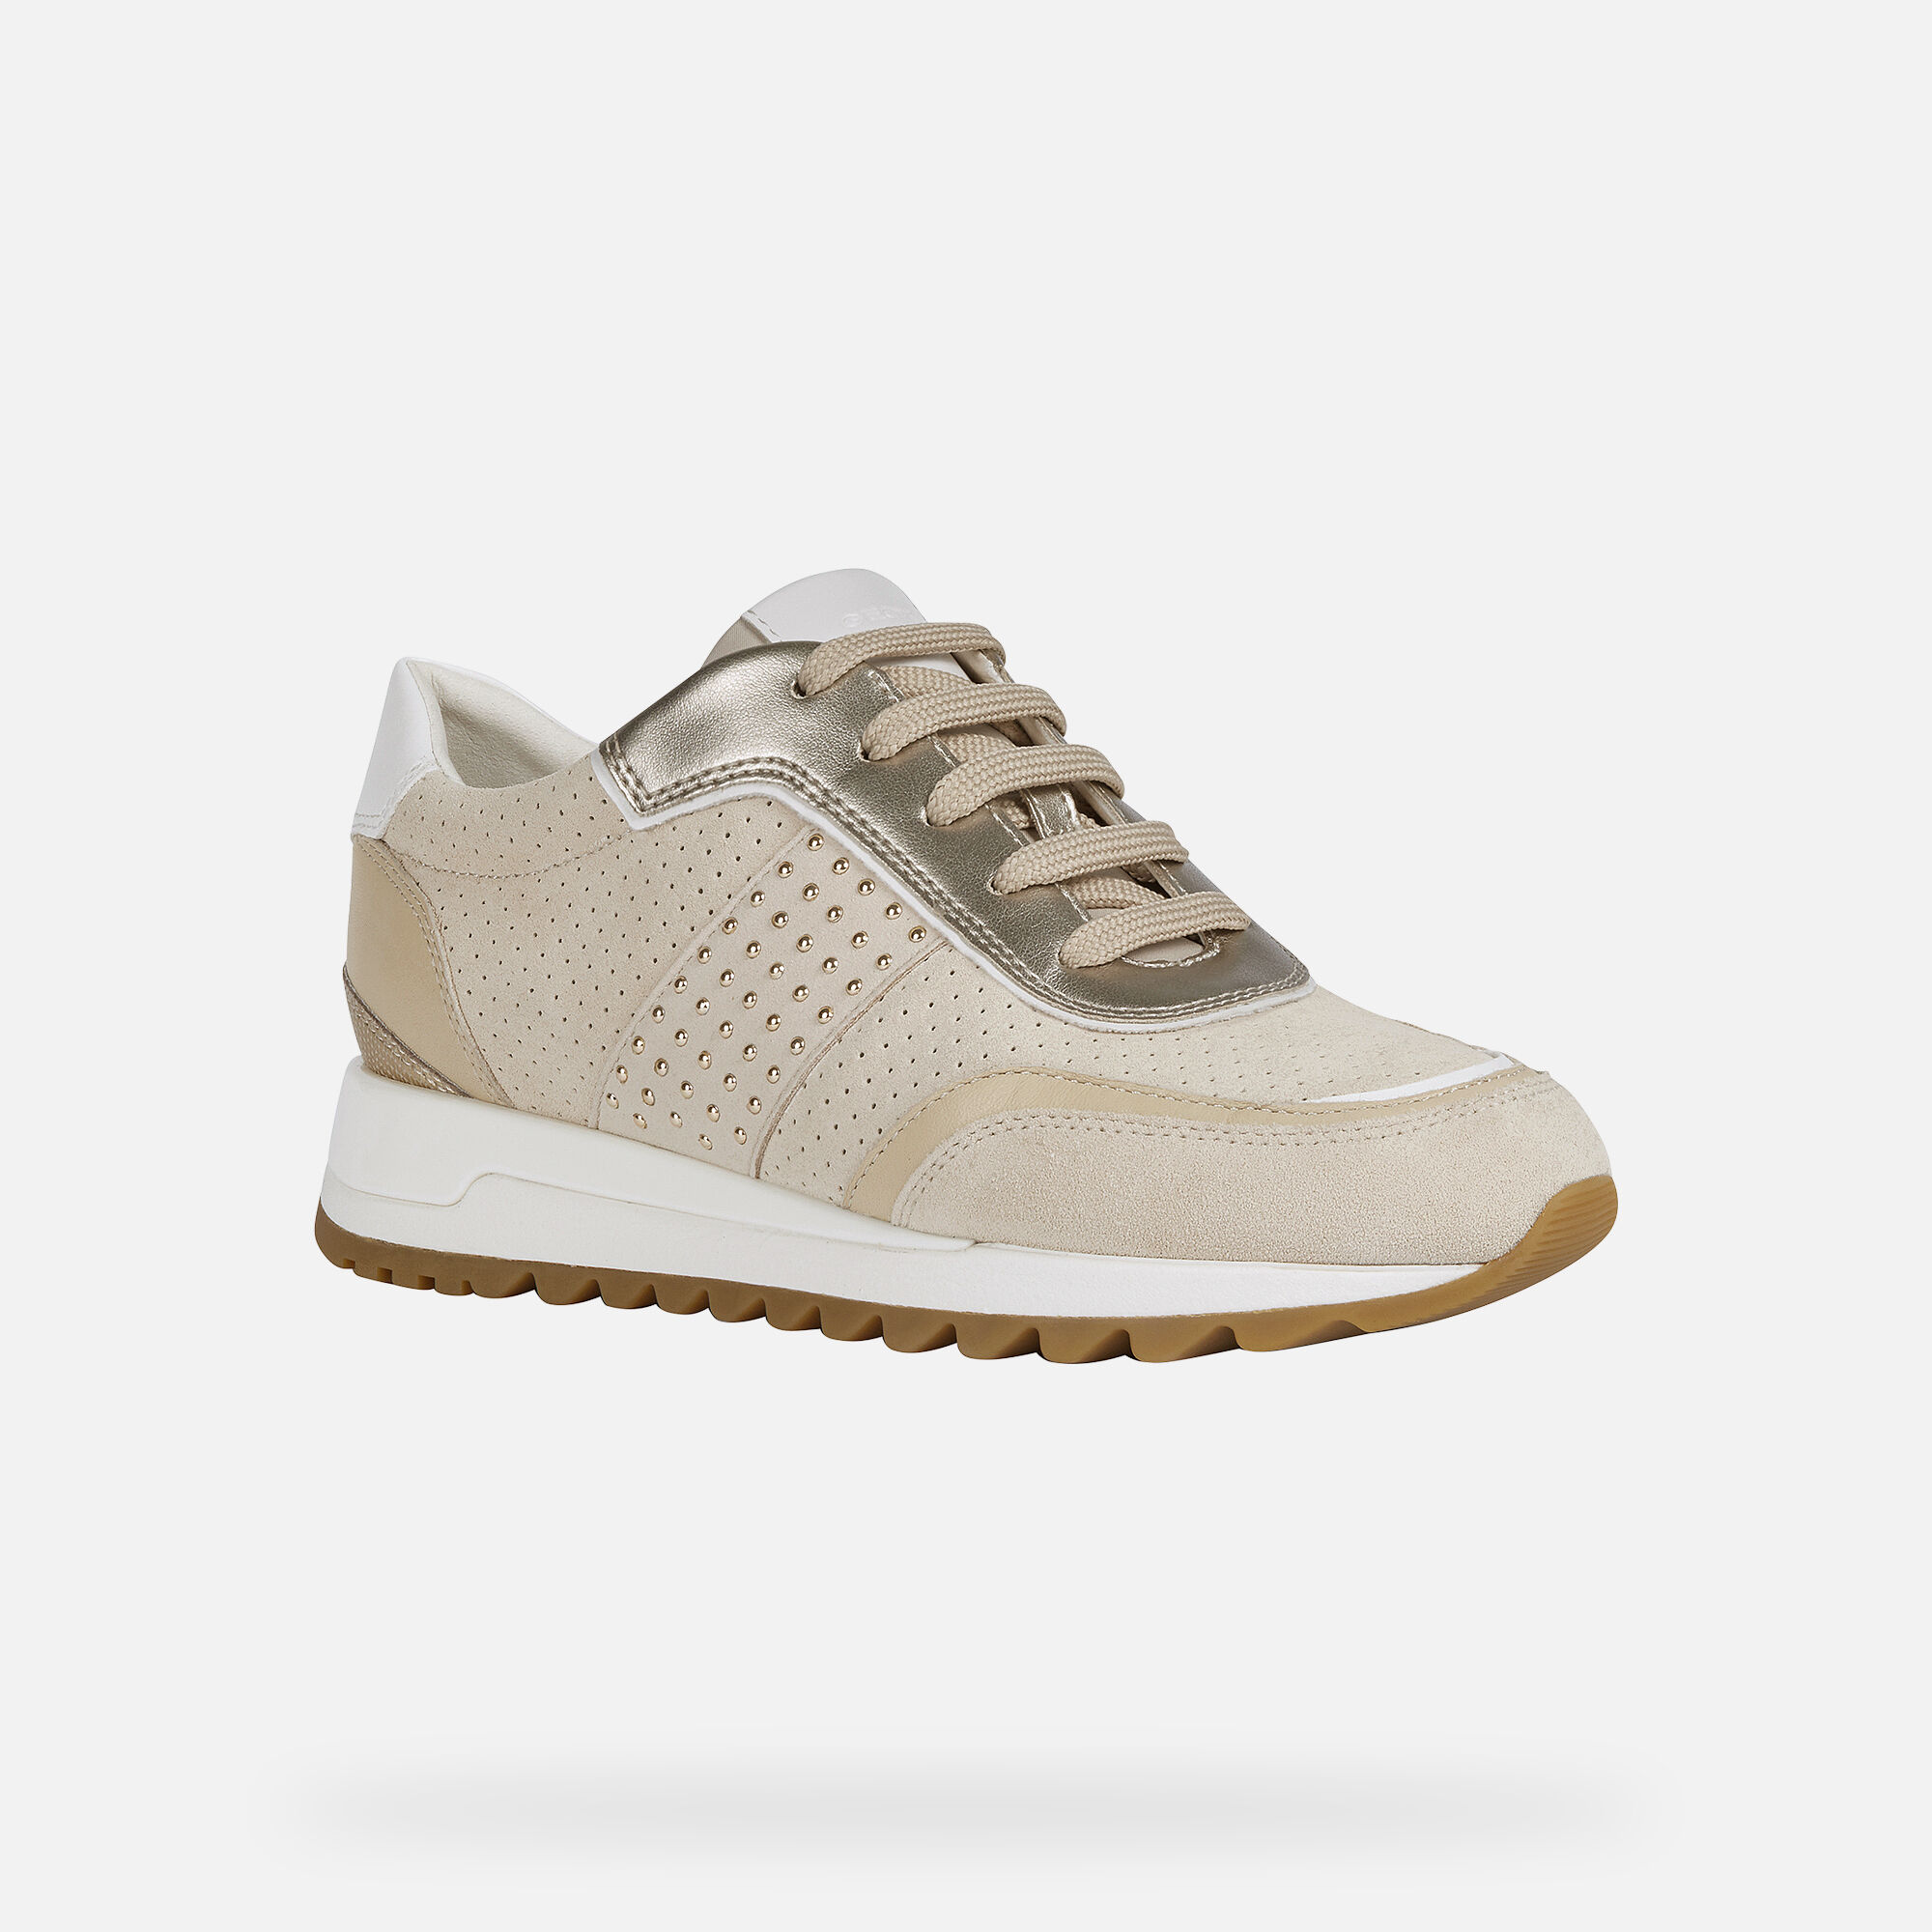 Geox Respira Womens Wedge Sneakers Beige Gold Size 40 US 9